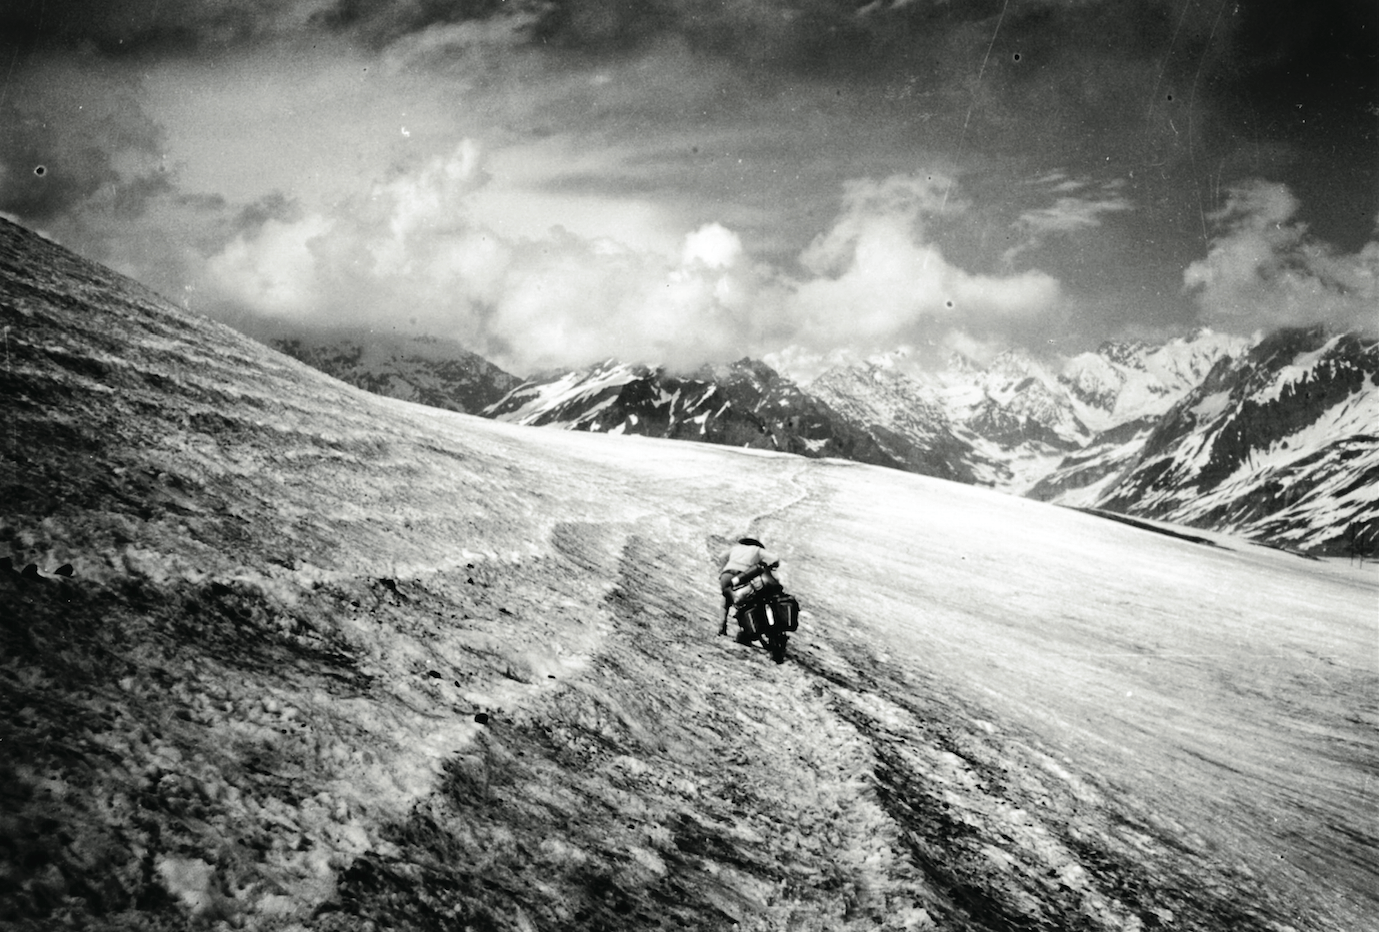 Photo voyage - Paule & Arthur - Himalaya - Bouts du monde